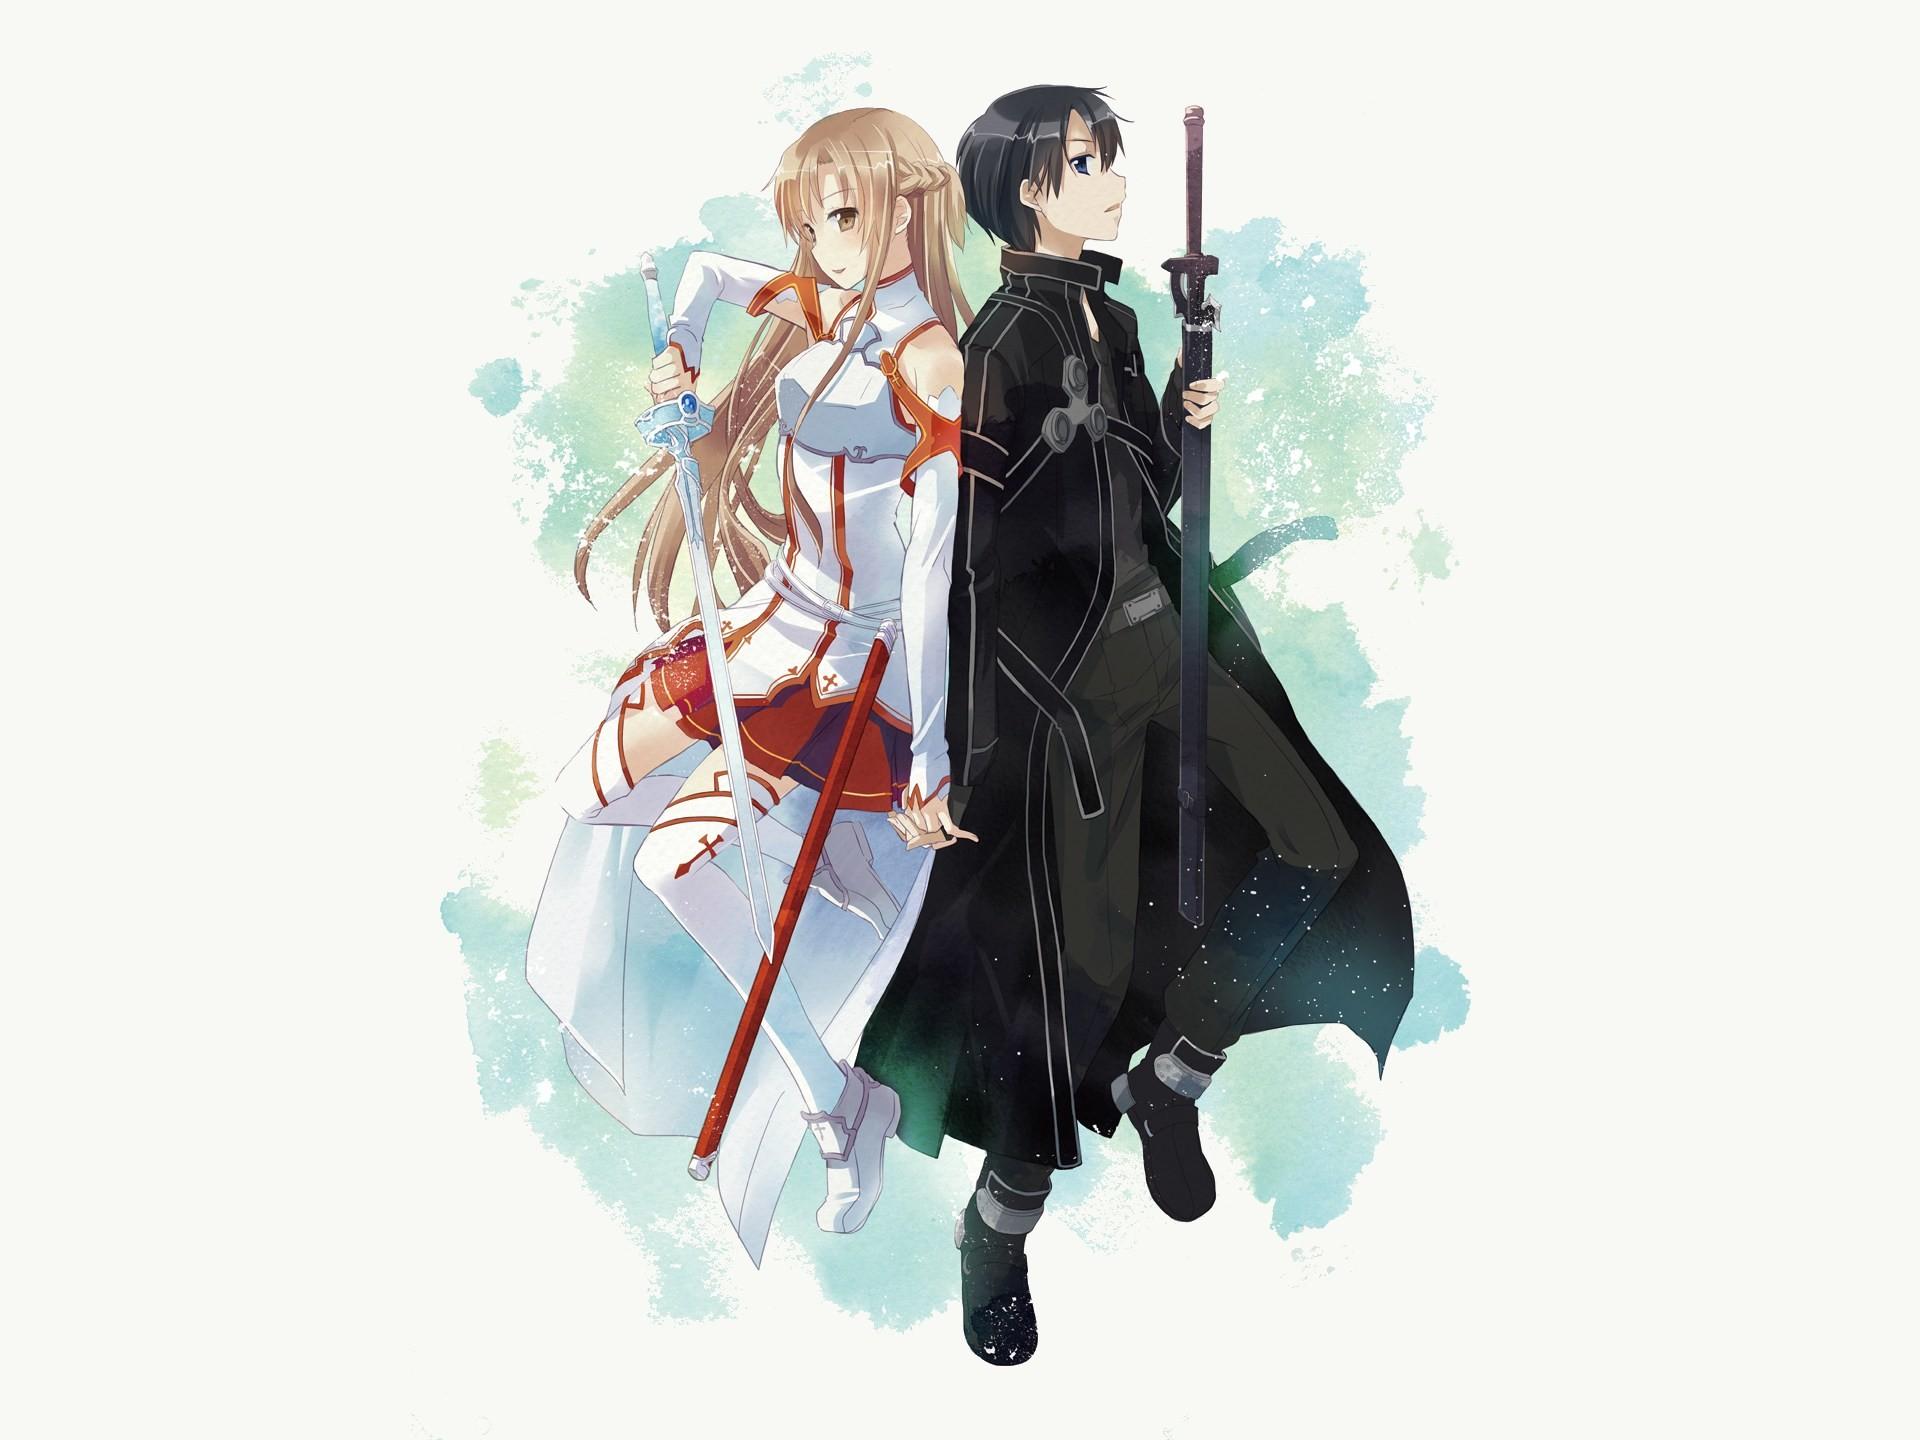 Asuna & Kirito – By Sword Art Online Kirito and Asuna ღ